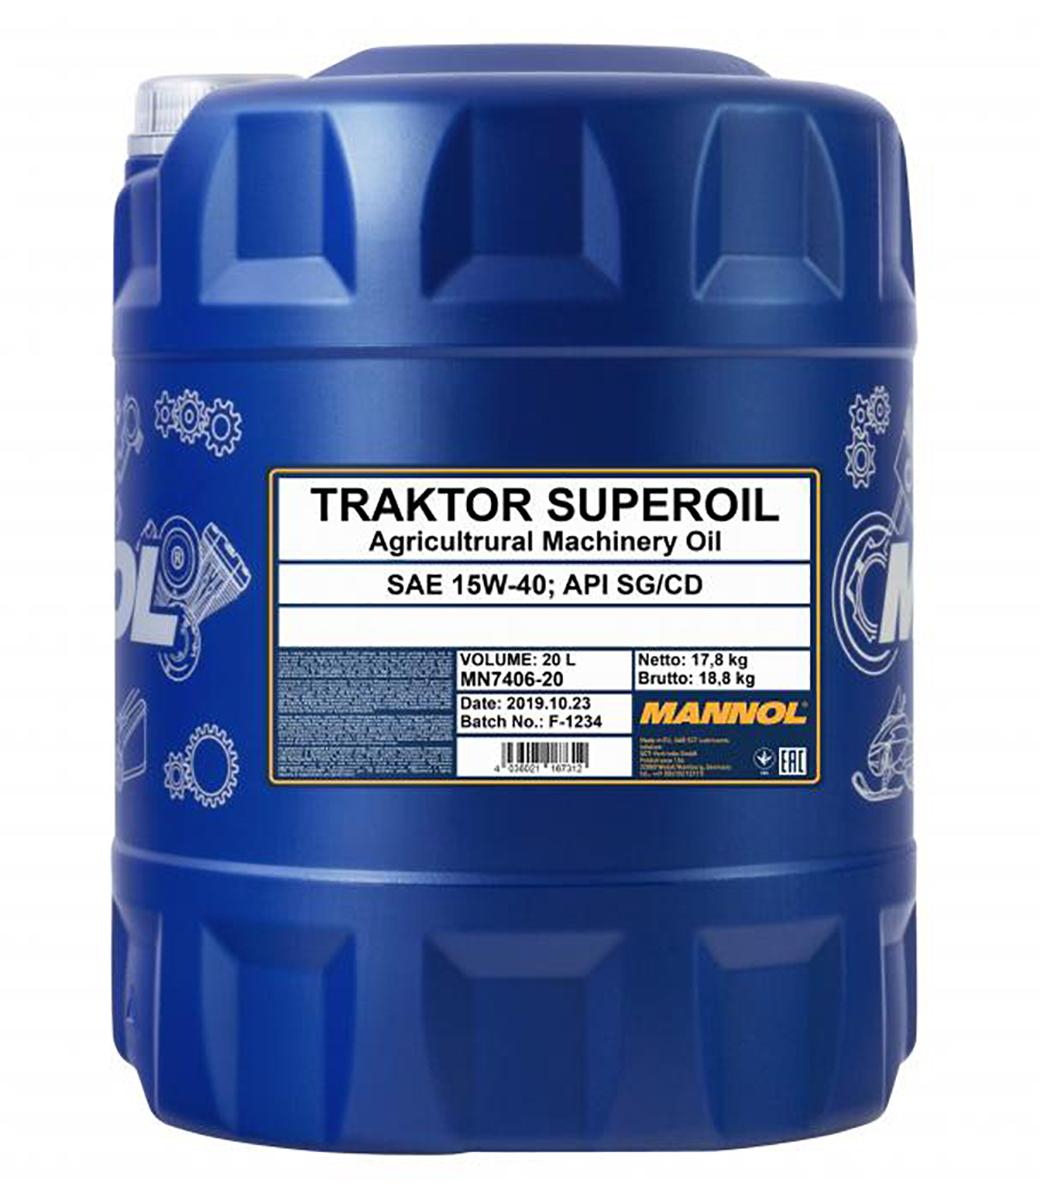 Traktor Superoil 15W-40